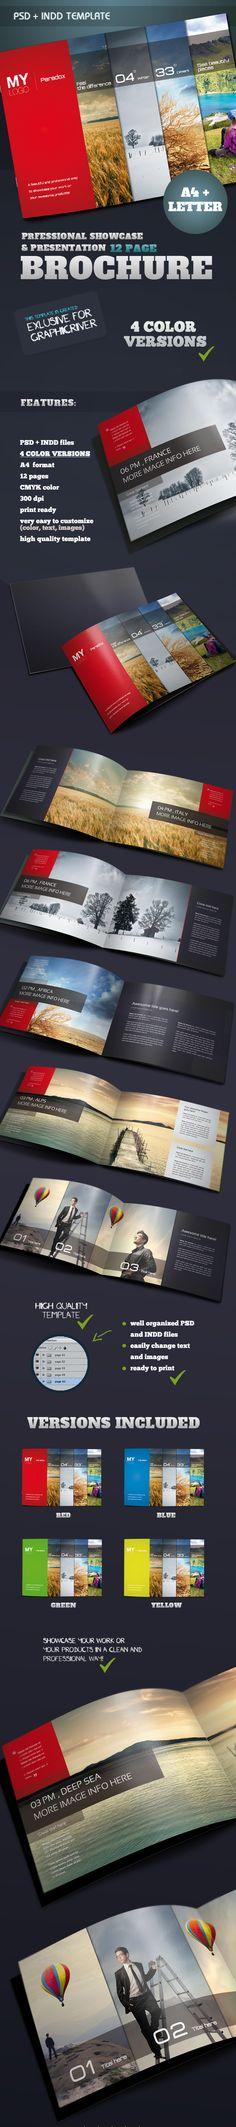 Portfolio & Showcase Brochure by Danijel Mokic, via Behance